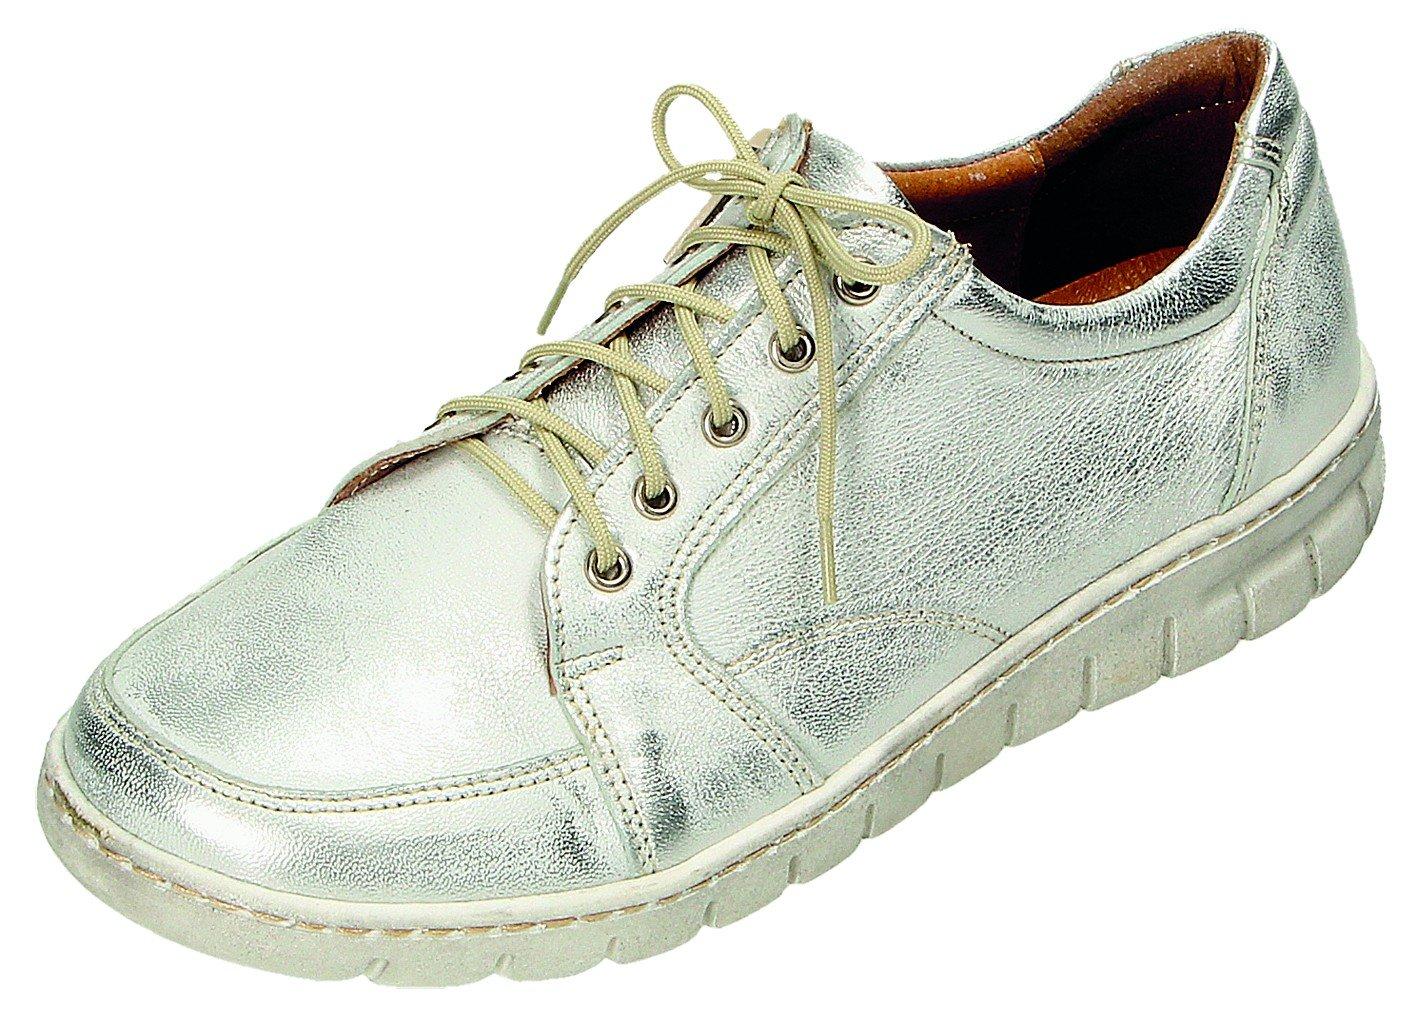 MICCOS Zapatos de Cordones Para Mujer Plateado Plata 41 EU plata